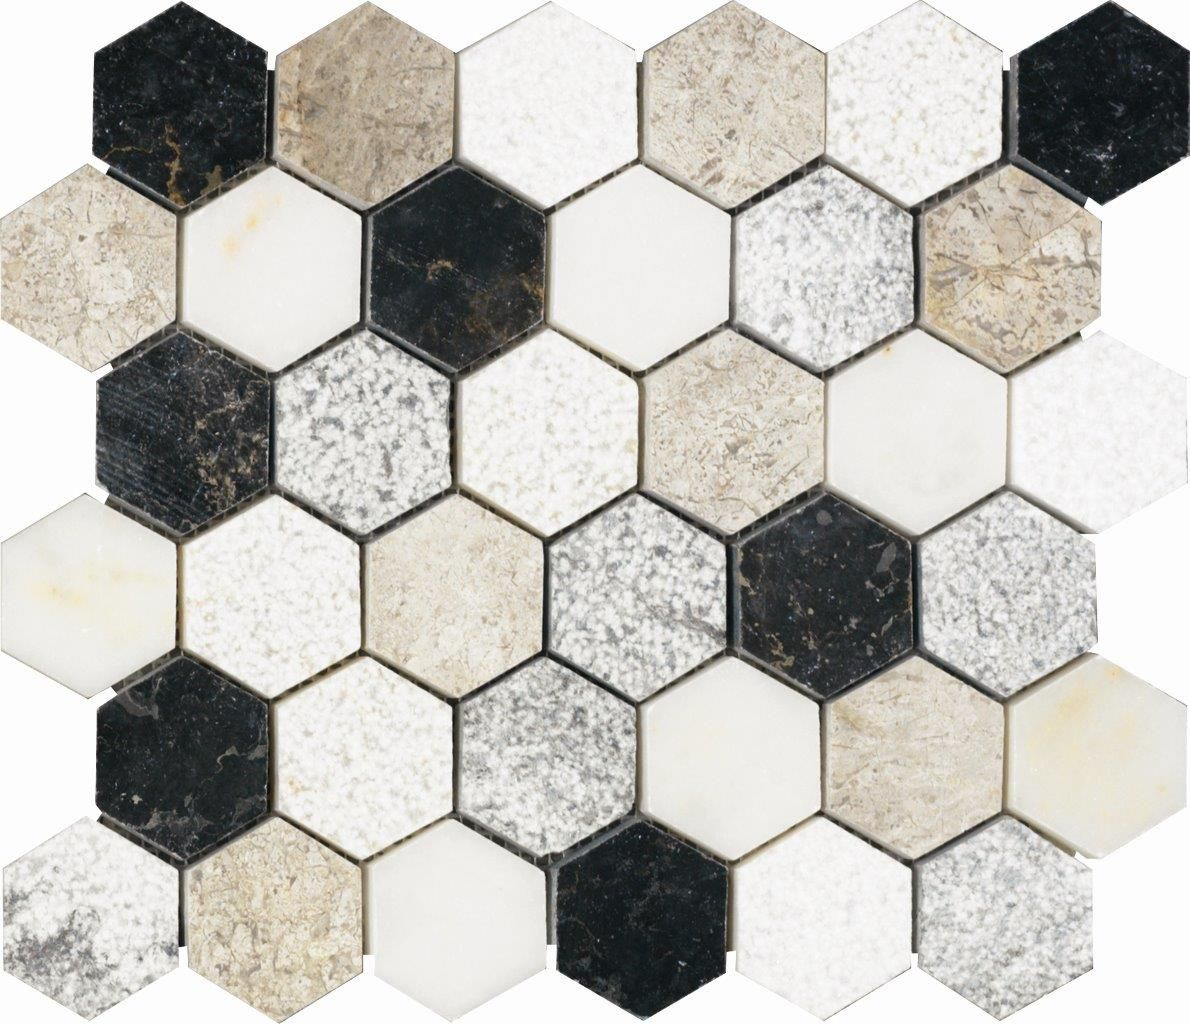 SOUL 30.9x30.9 cm: Elegante mosaico hexagonal que combina varios ...